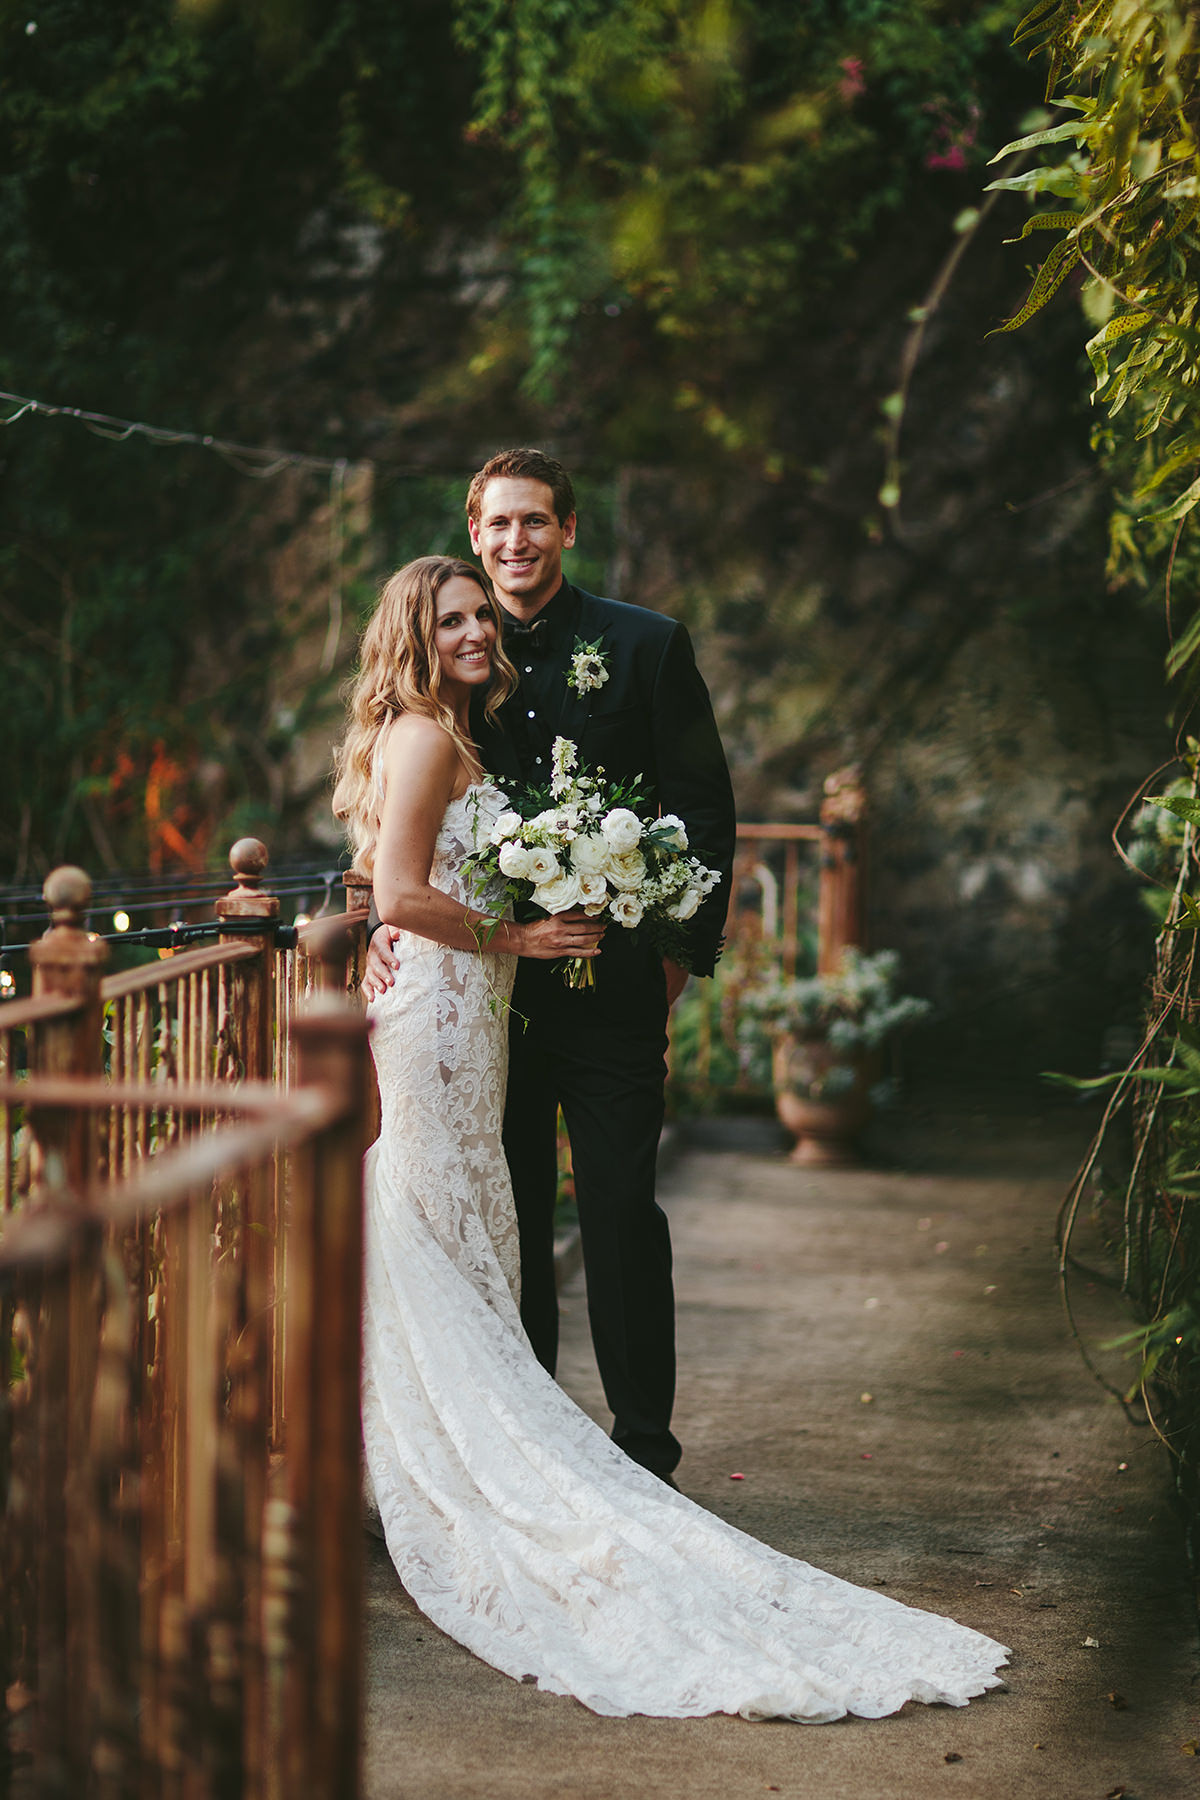 sarah daniel wedding bride and groom in wooded area